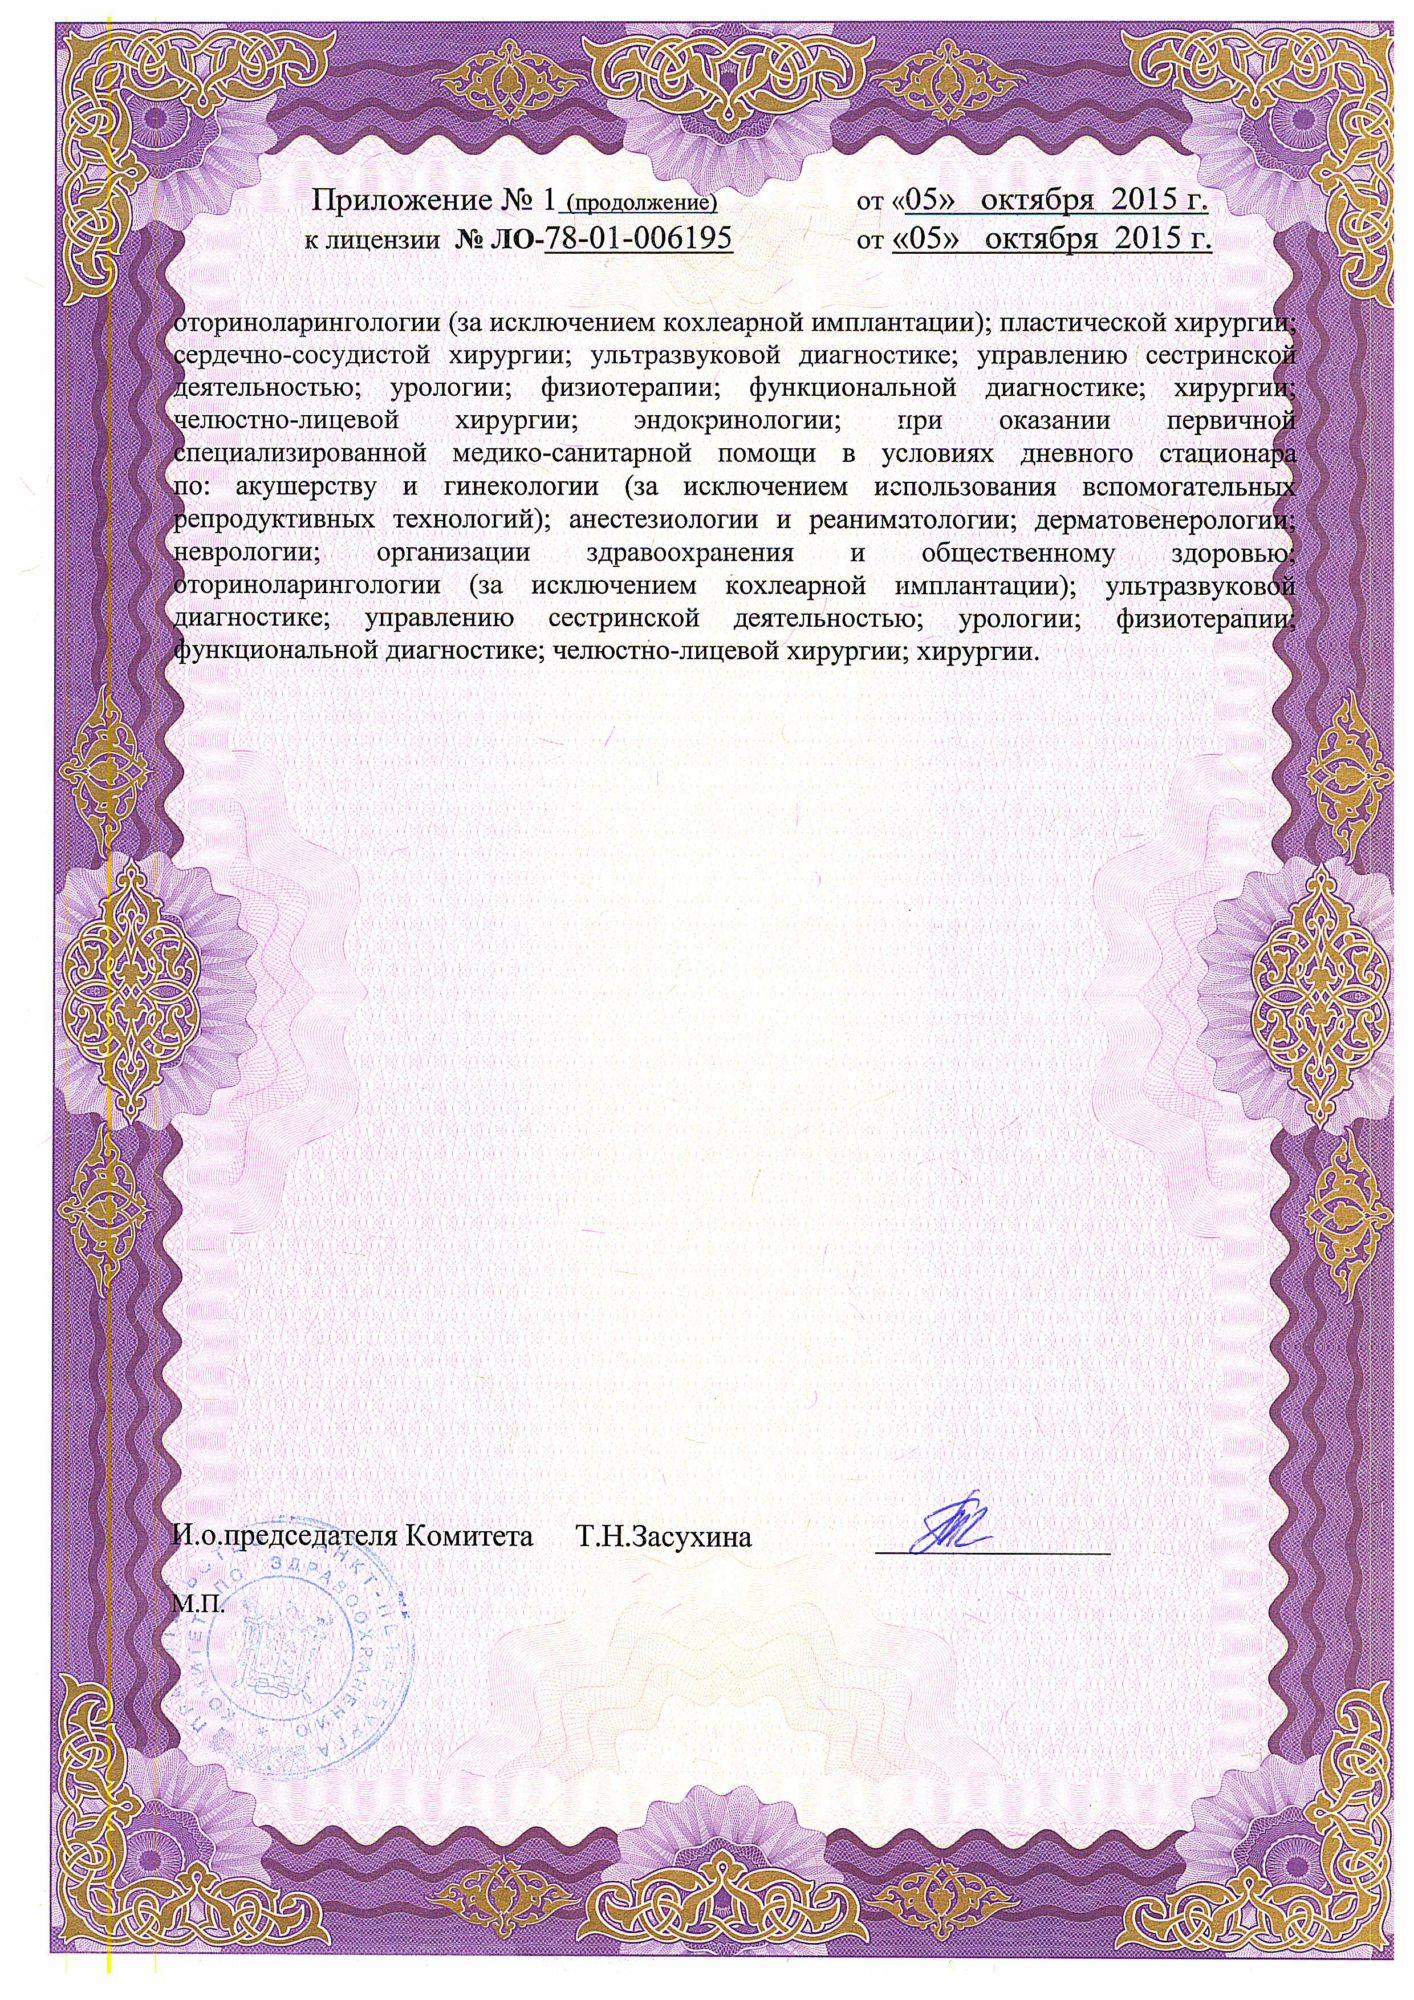 licenziya-4-new